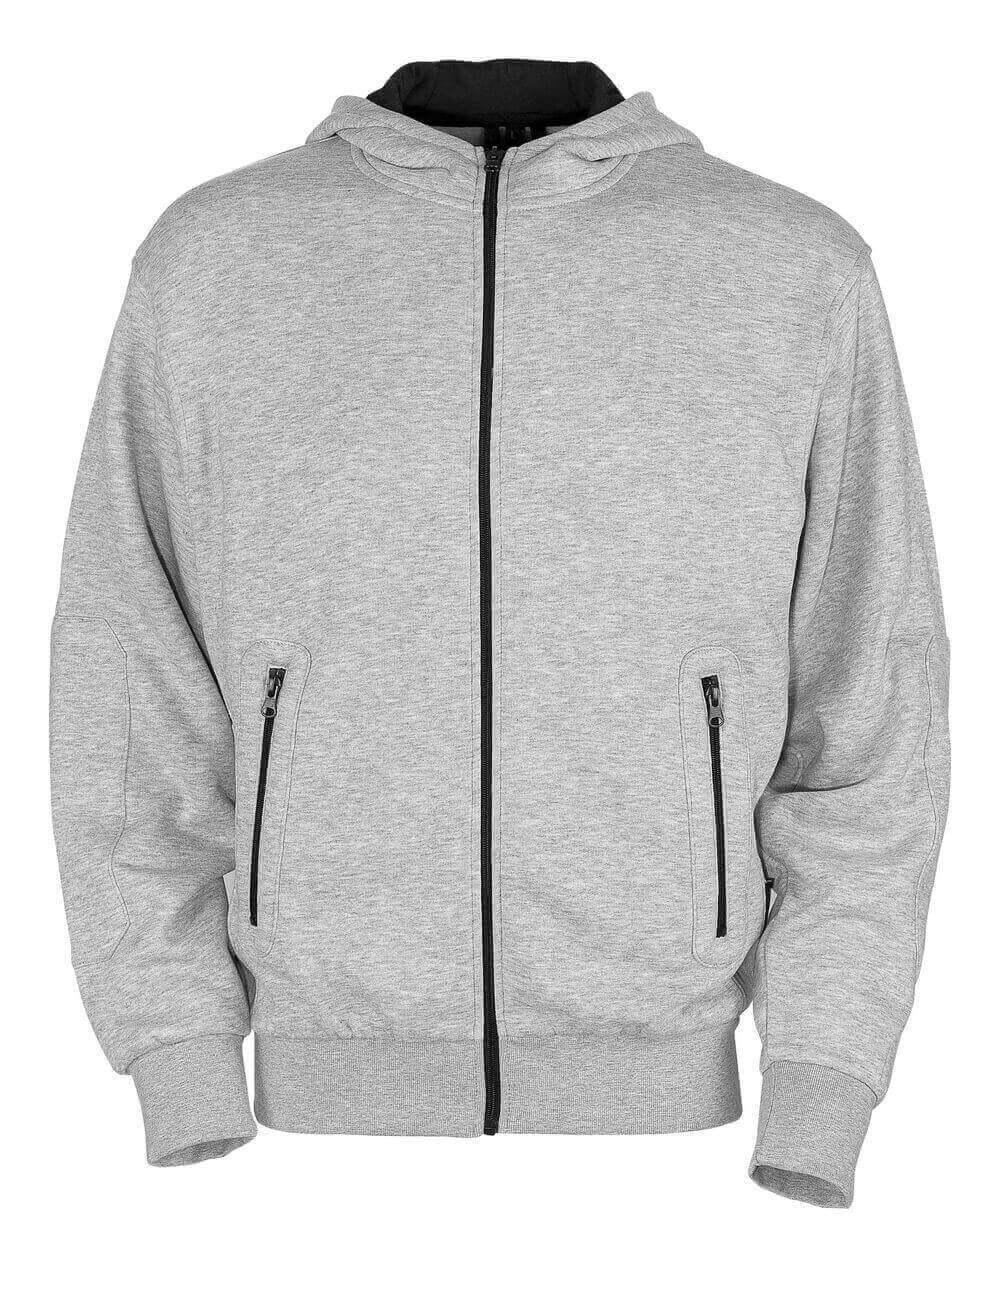 50423-191-08 Hoodie with zipper - grey-flecked